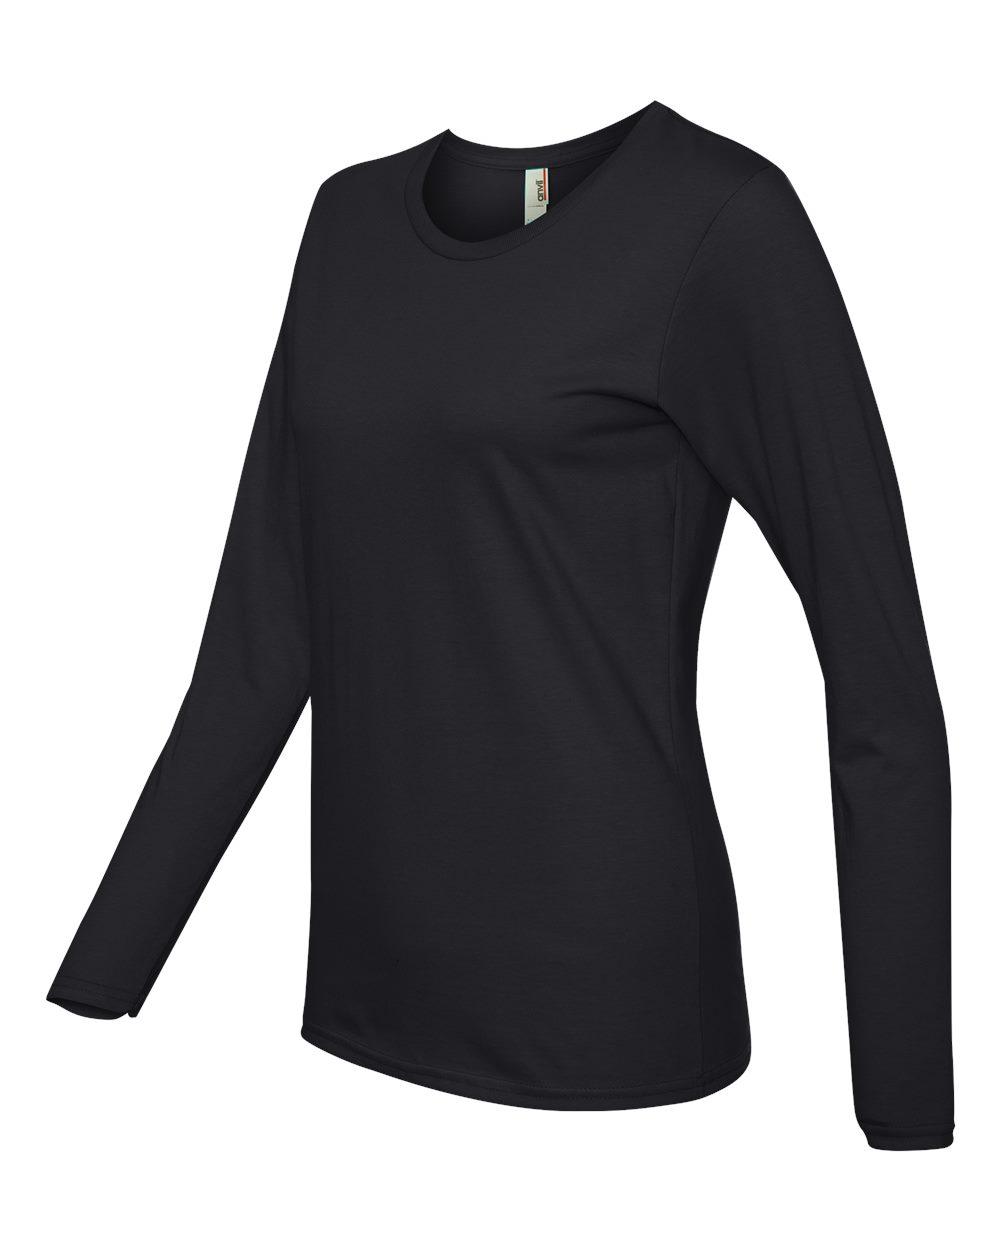 Anvil-Womens-Lightweight-Long-Sleeve-T-Shirt-884L-Size-S-2XL thumbnail 4